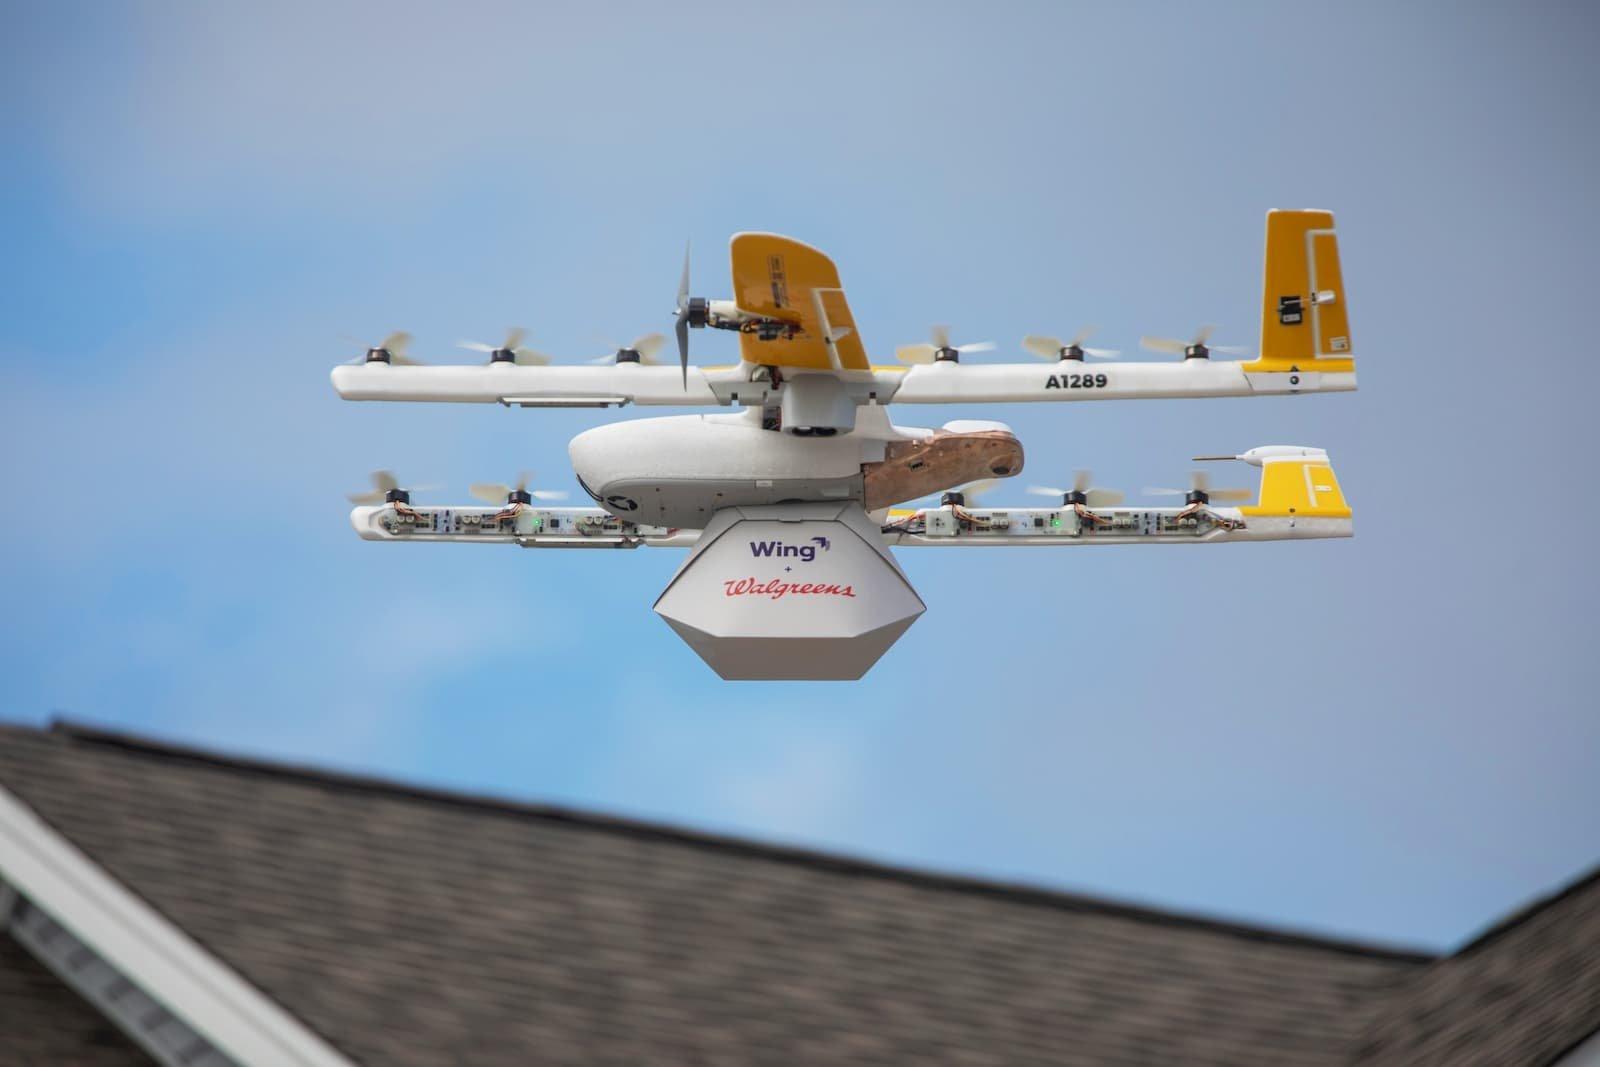 drone run by alphabet